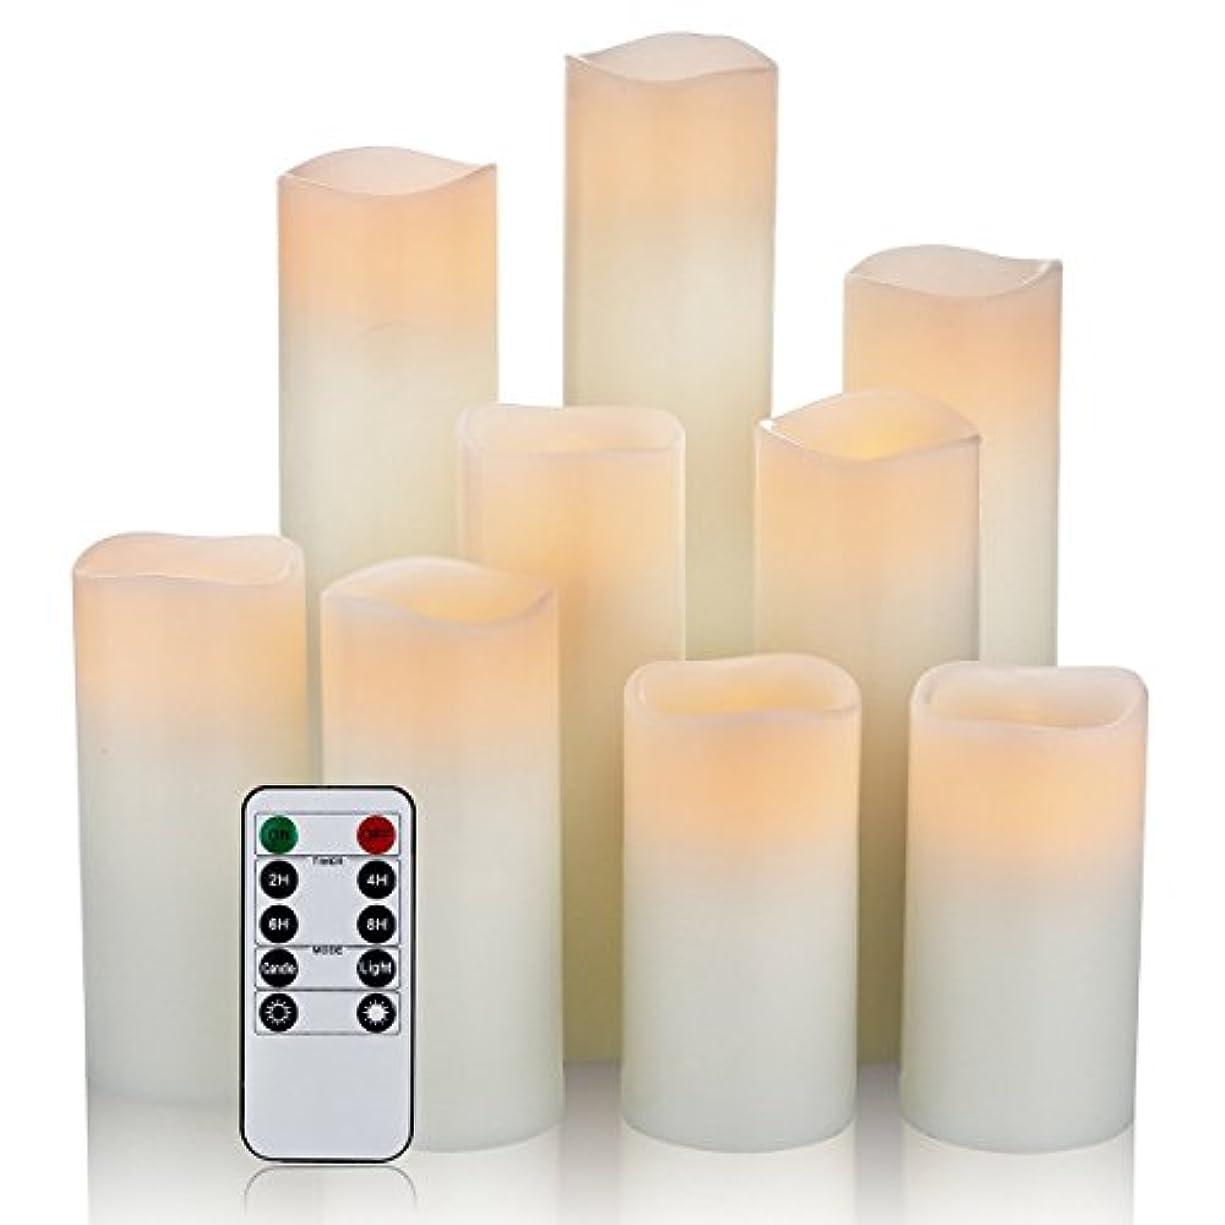 (9pc - 2.2 Diameter) - One World Magic Candle Set - Flameless, Battery Operated Real Wax Ivory Pillar Vanilla...